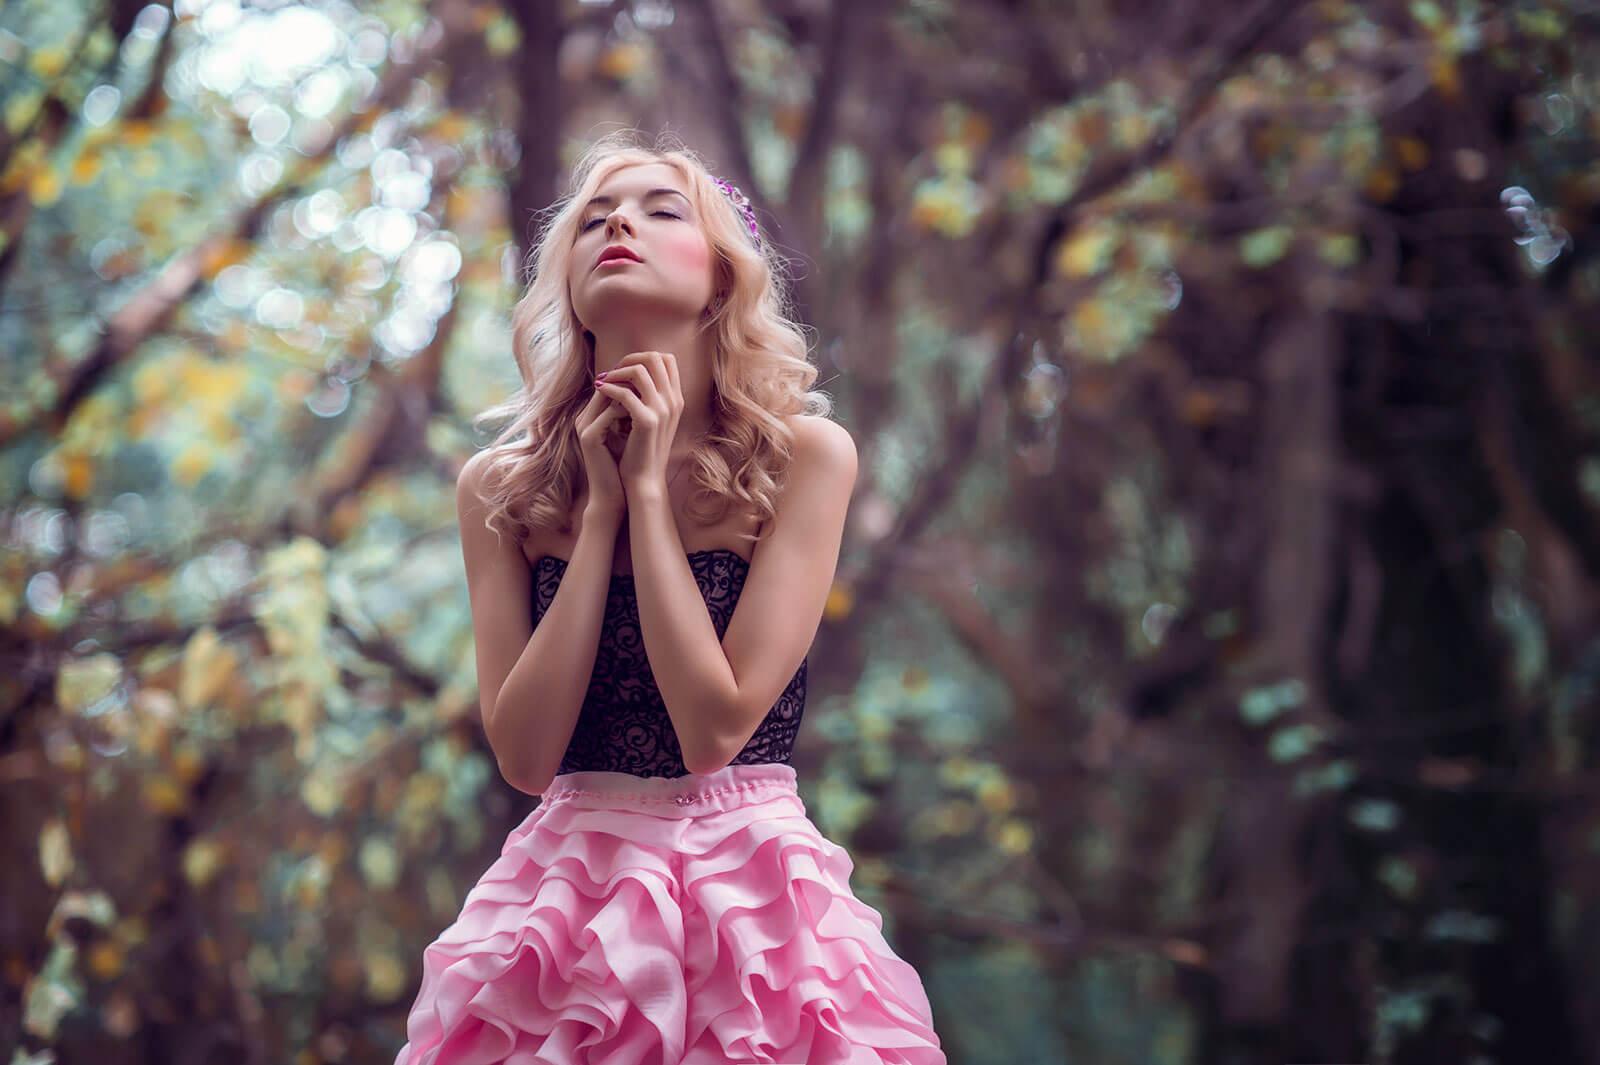 Rapariga de vestido cor-de-rosa numa floresta.